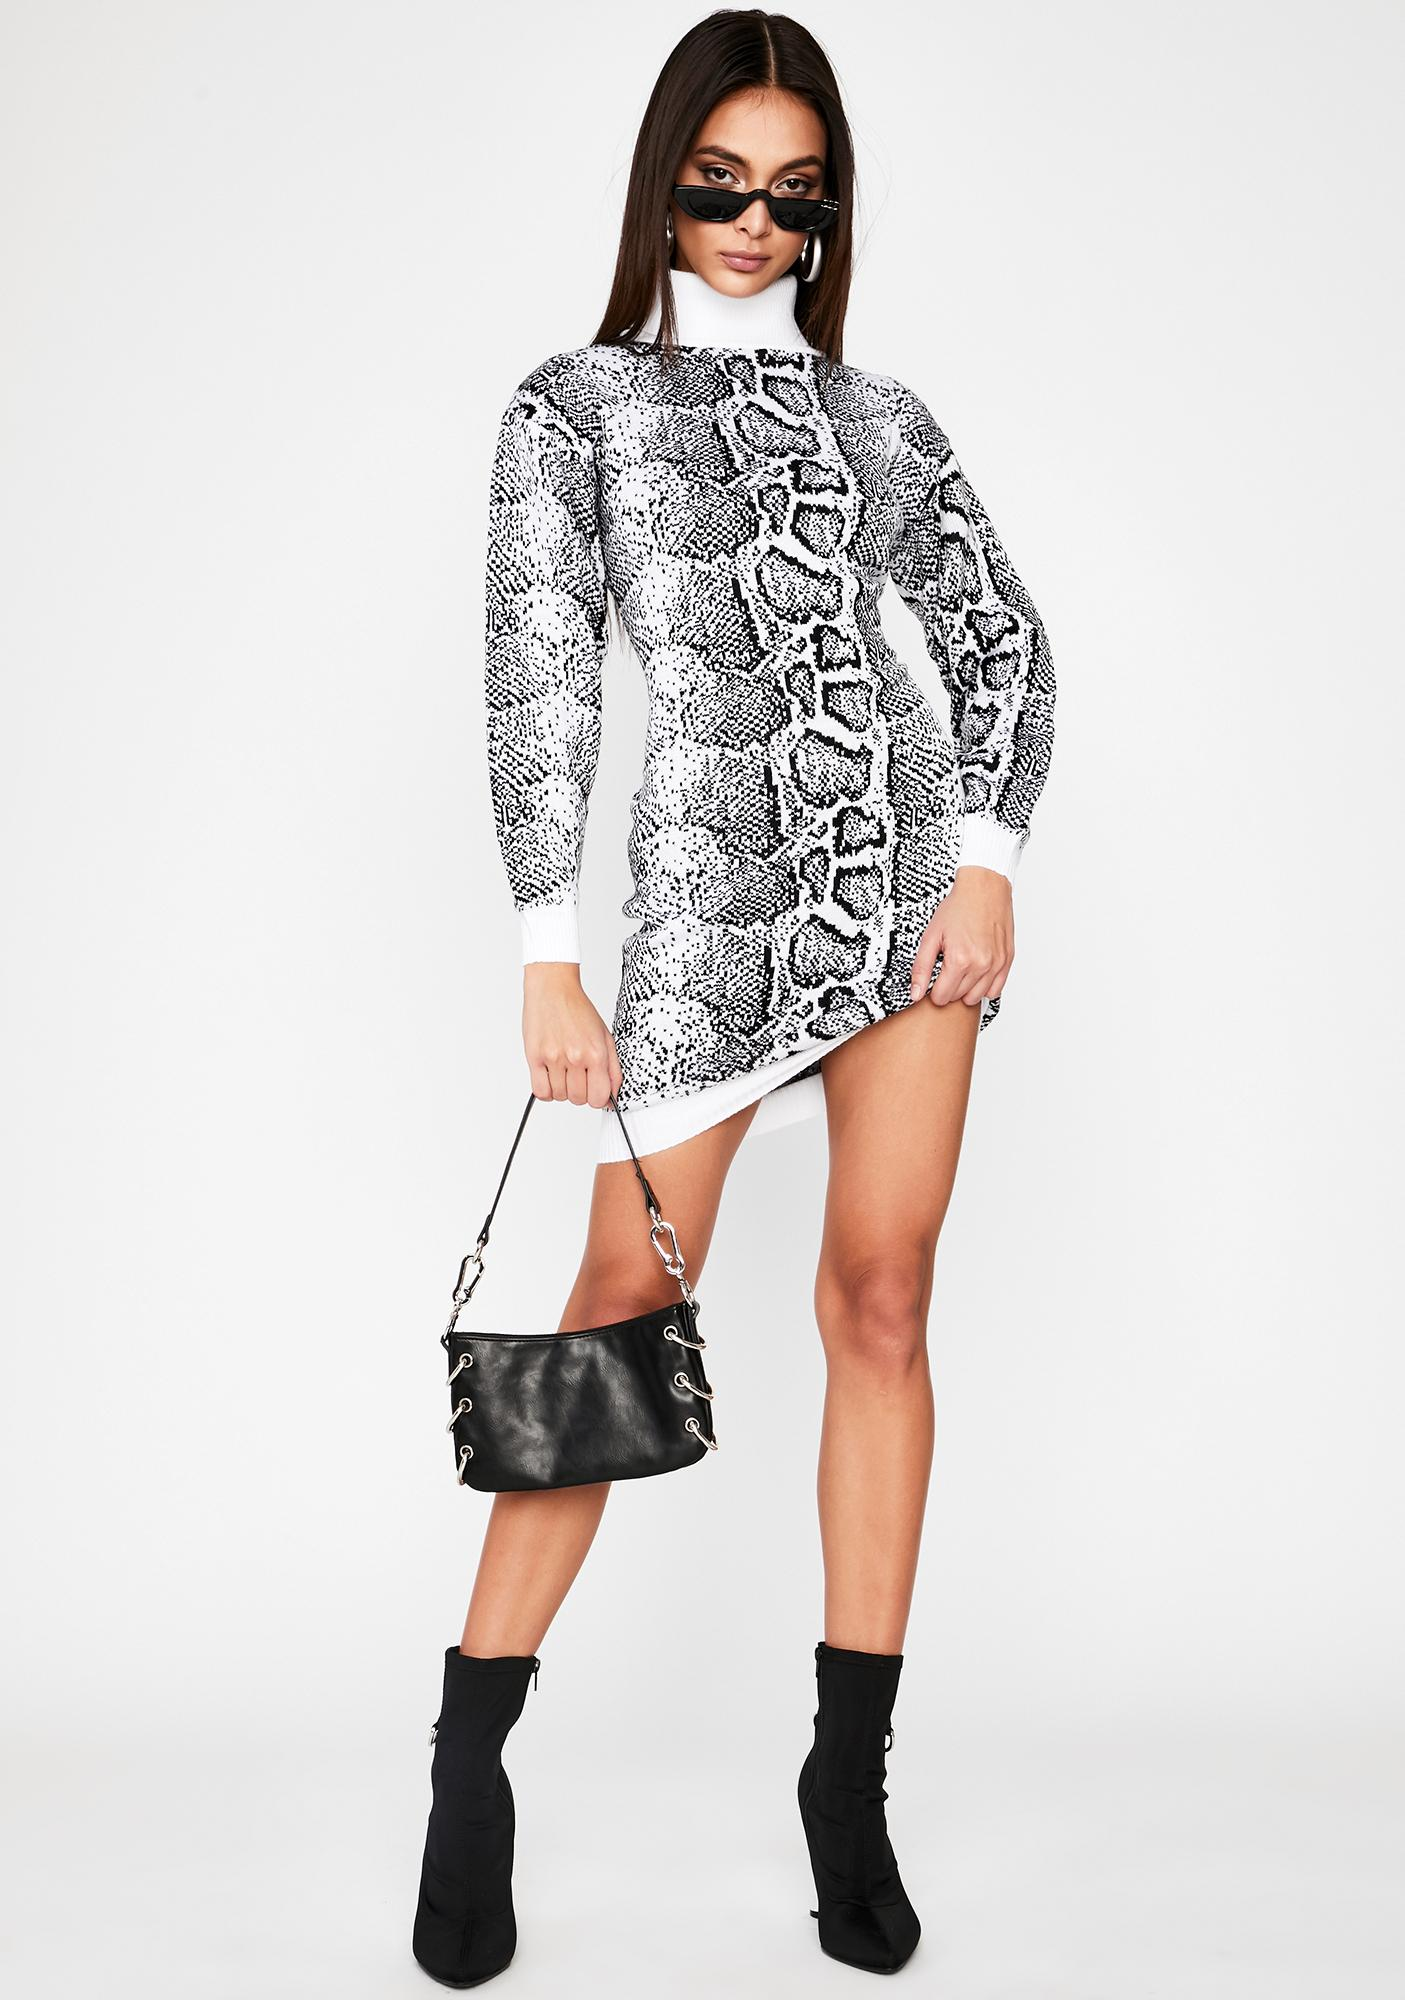 Intoxicated Twist Sweater Dress